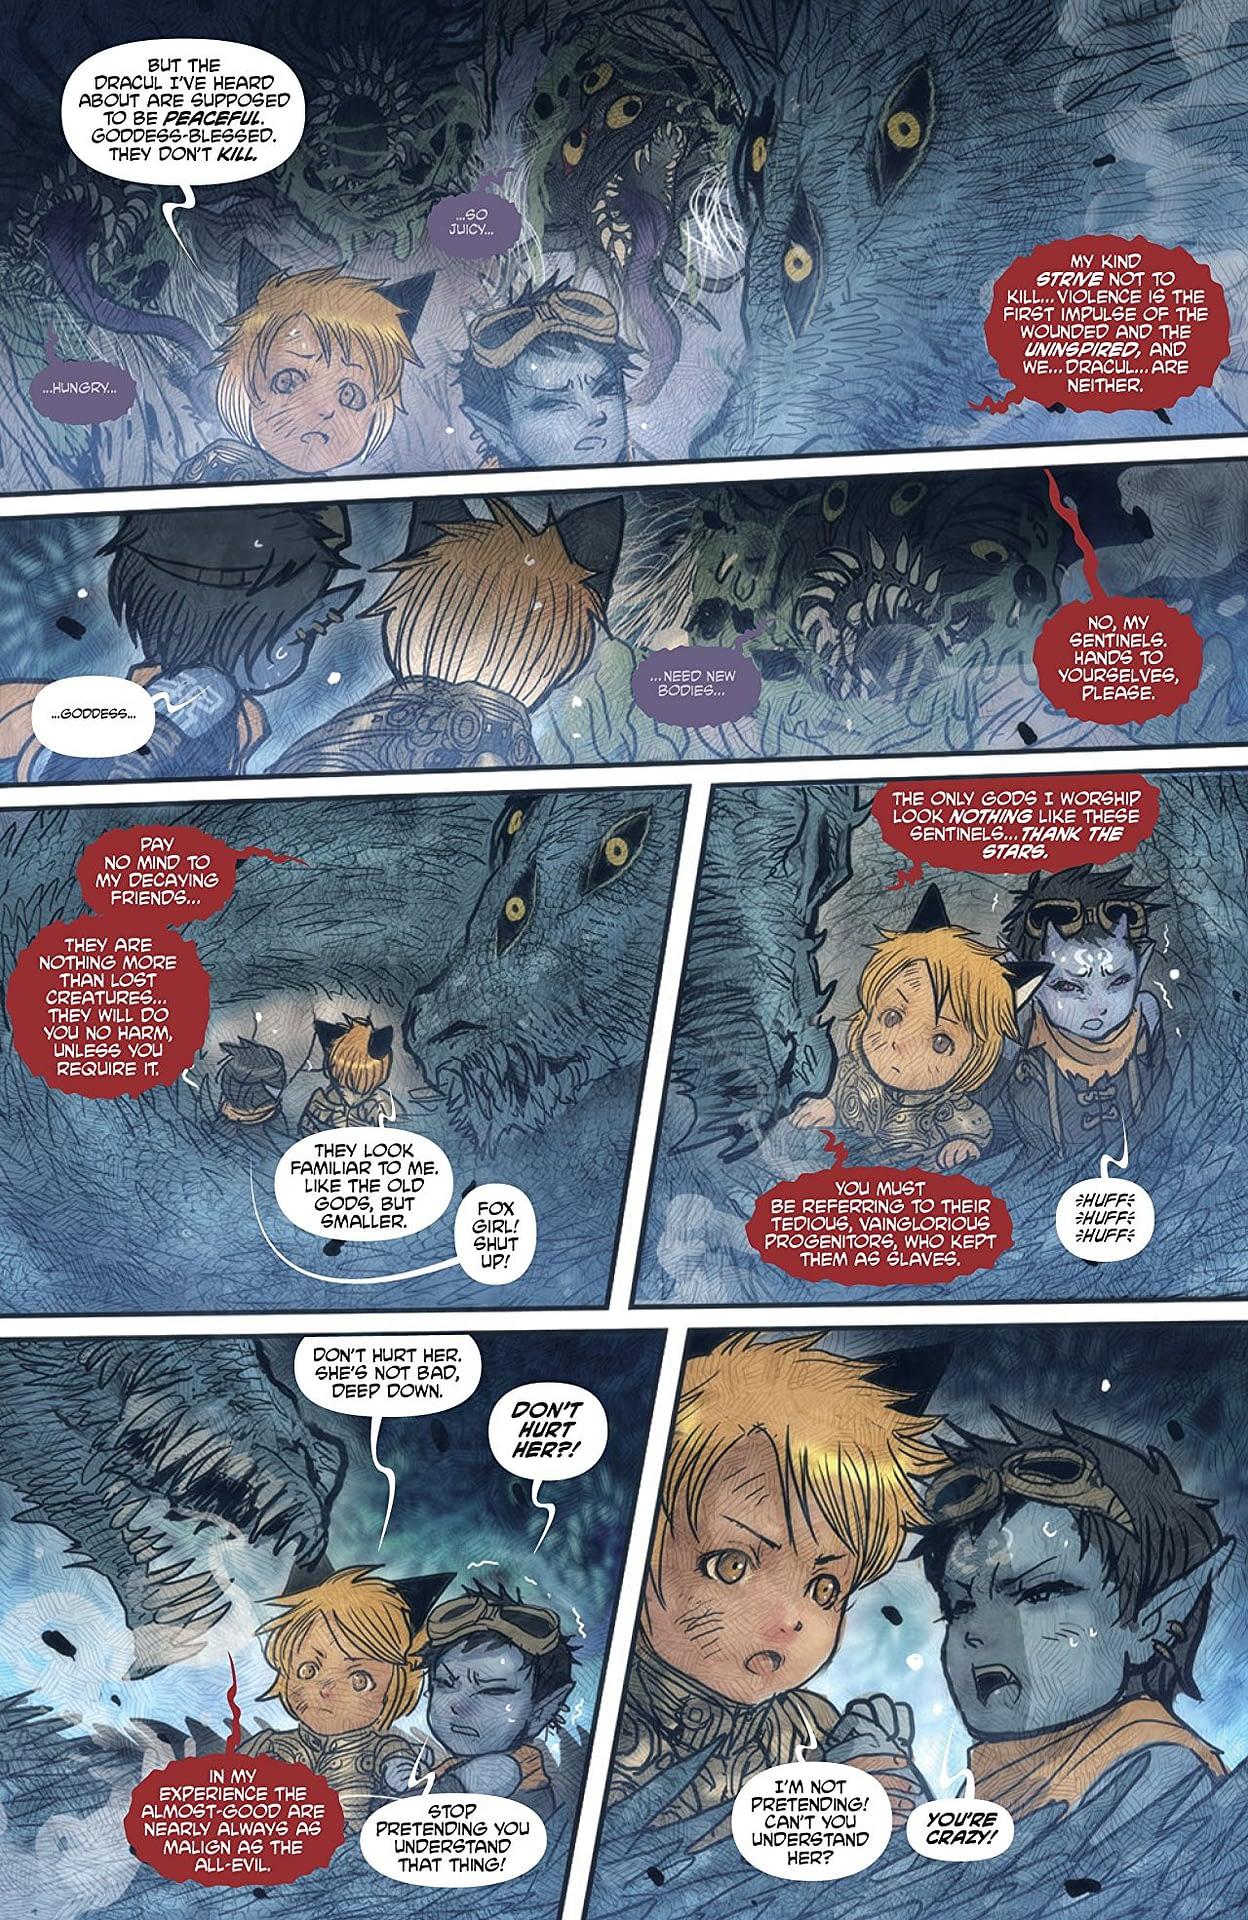 'Monstress' #22: Kippa Makes a Big New (Scary) Friend!